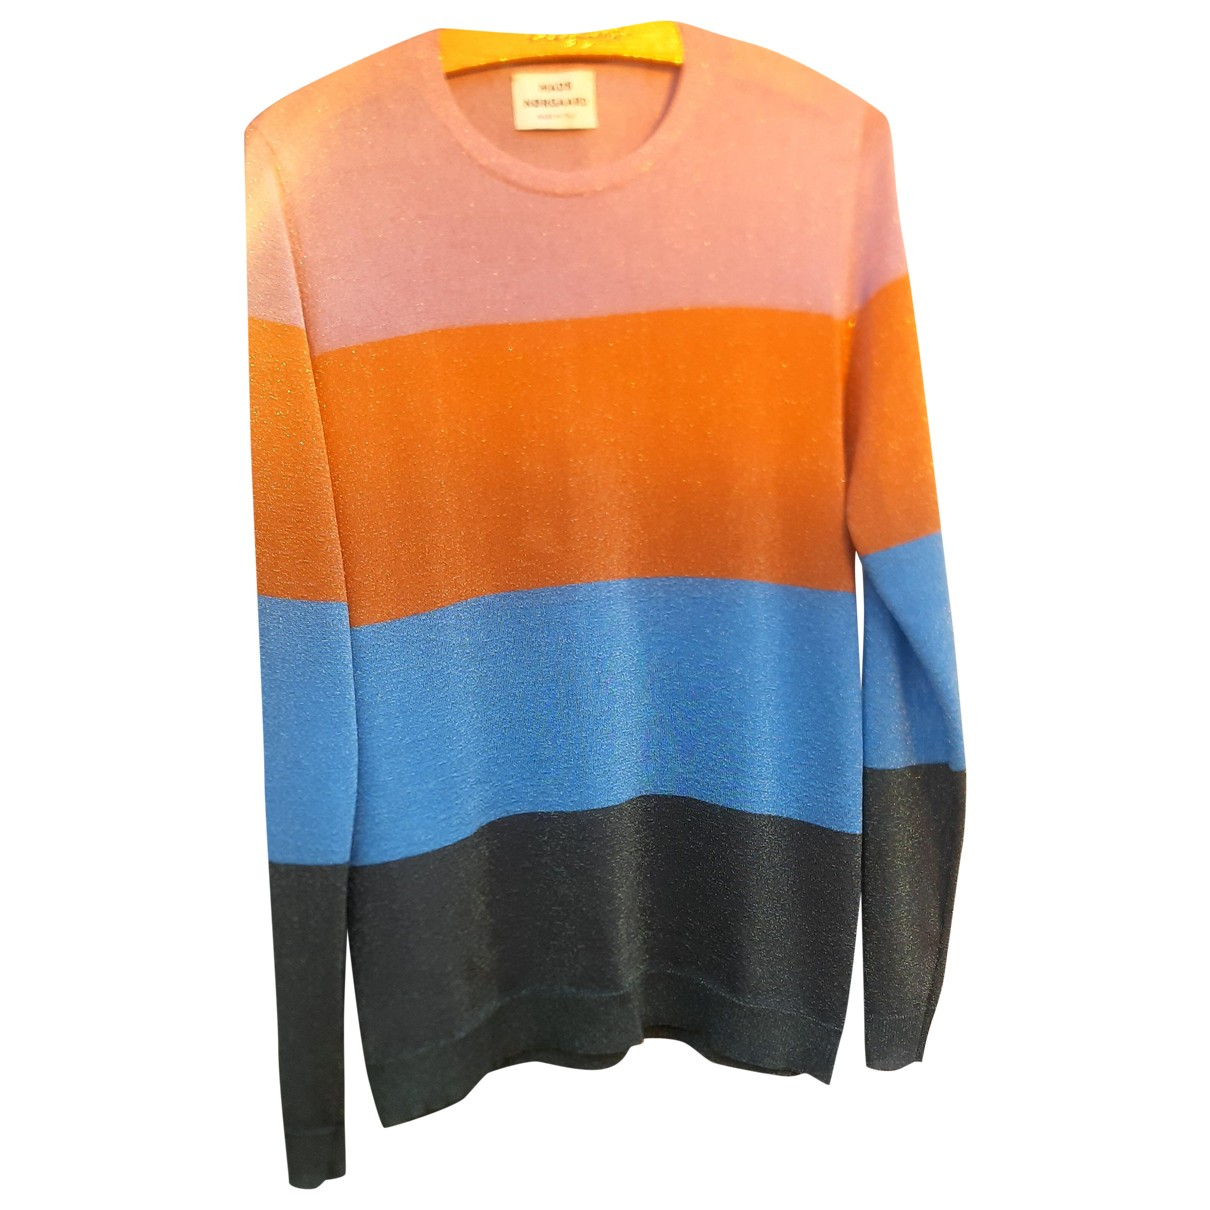 Mads Nørgaard \N Multicolour Knitwear for Women M International